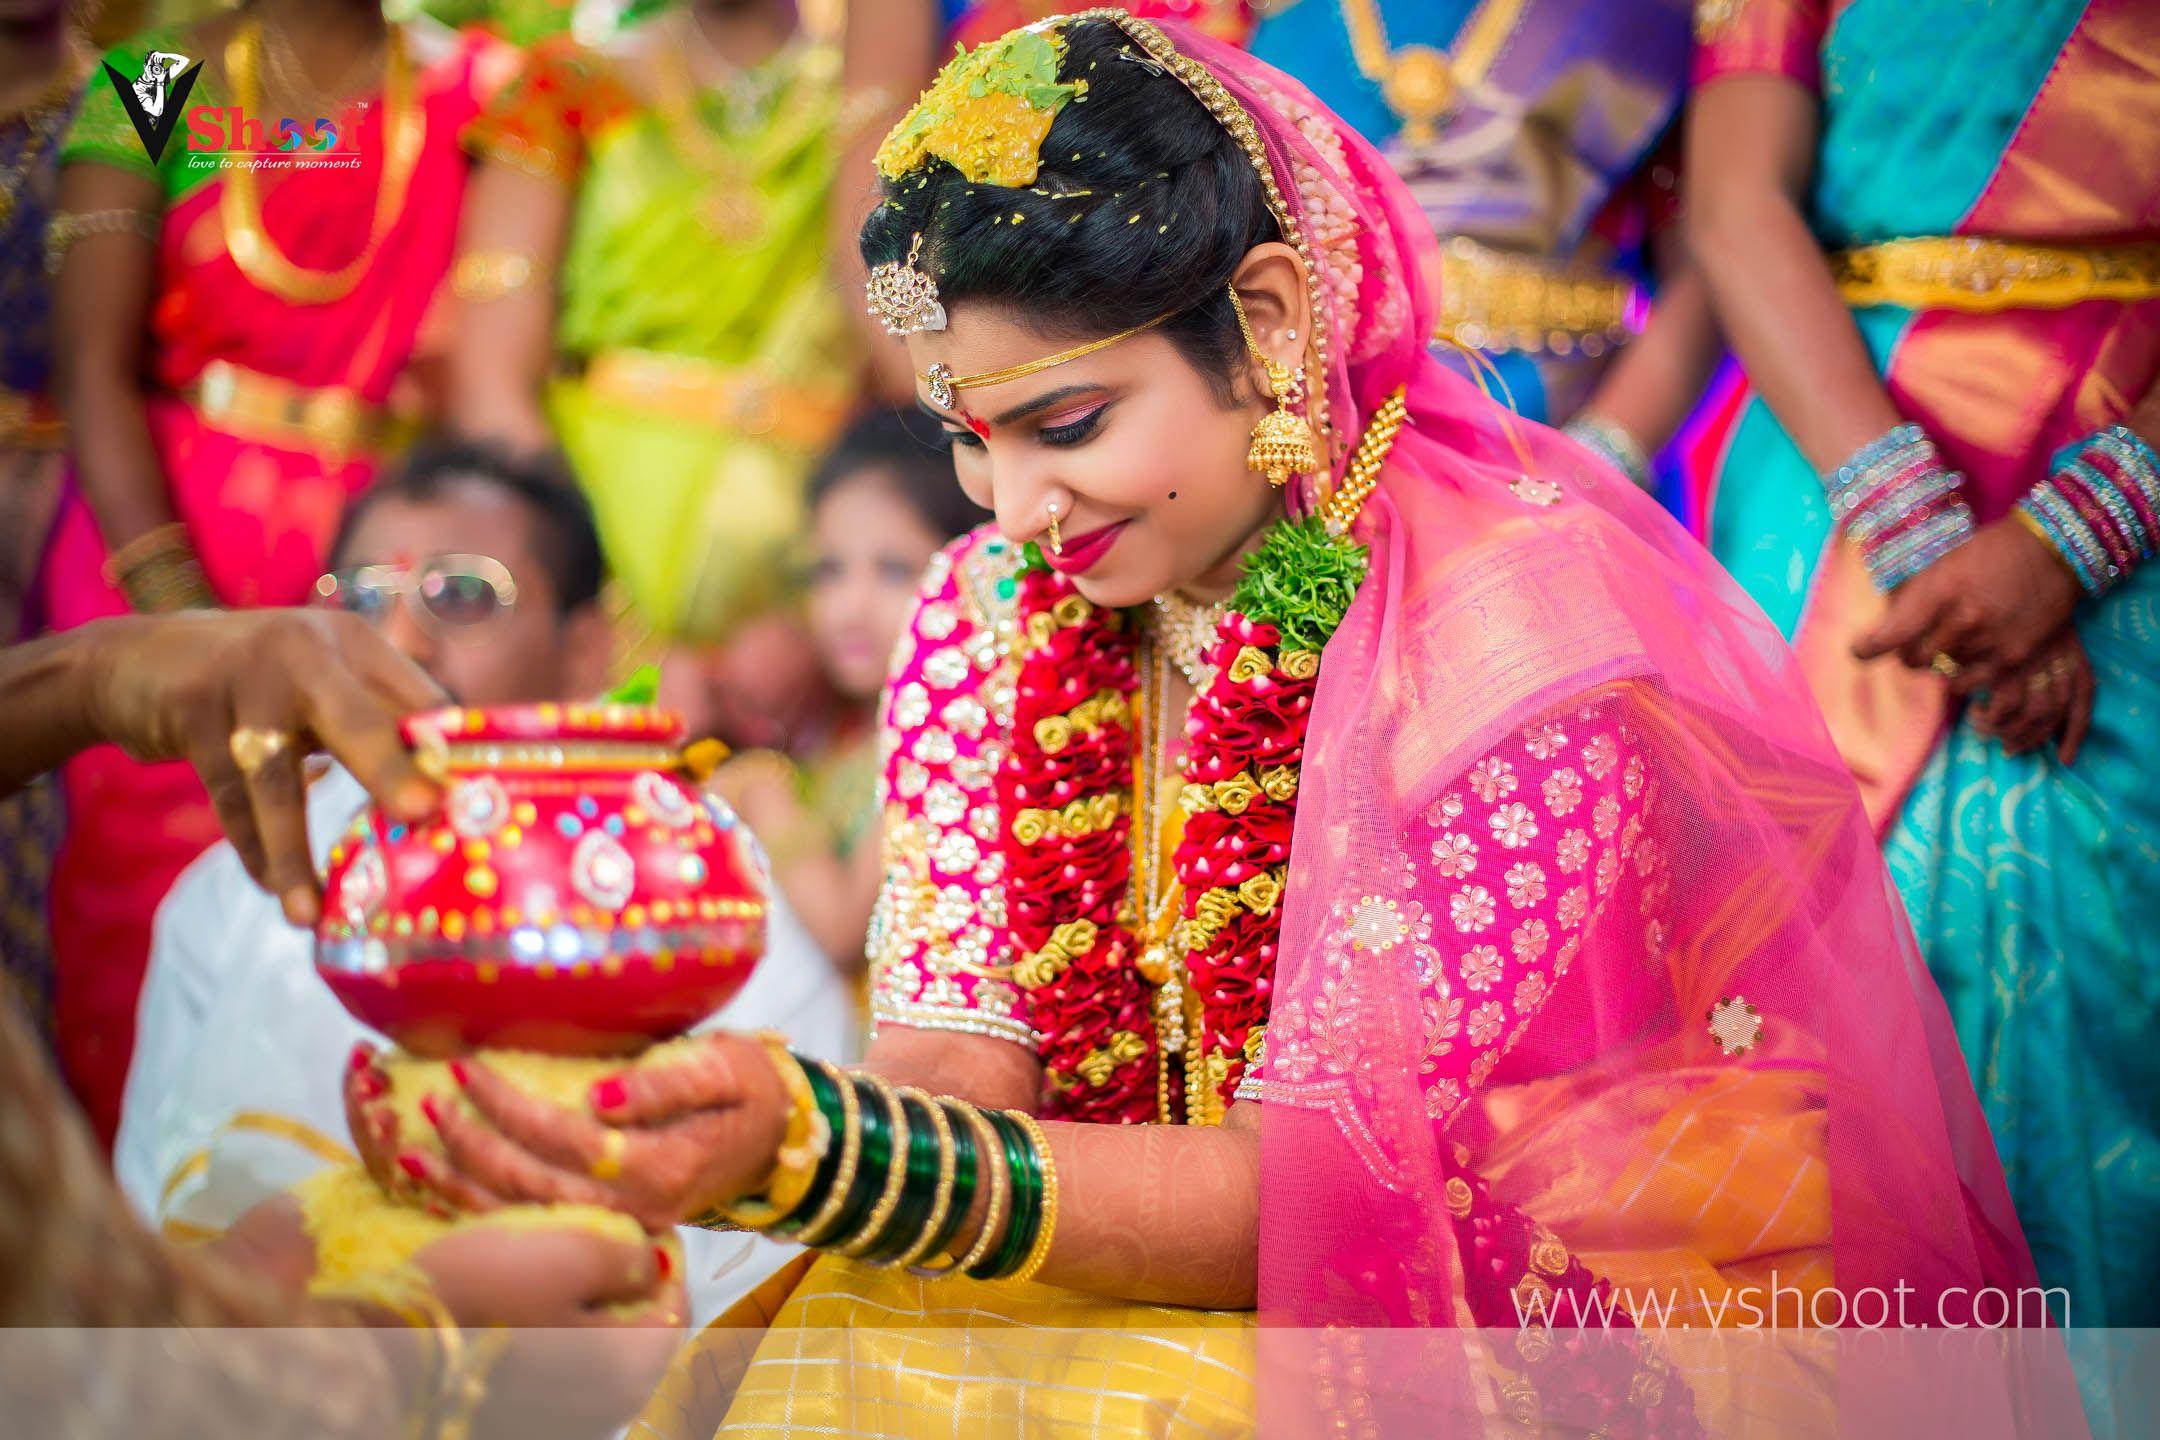 Pin by Vshoot on Hyderabad Wedding | Pinterest | Hyderabad